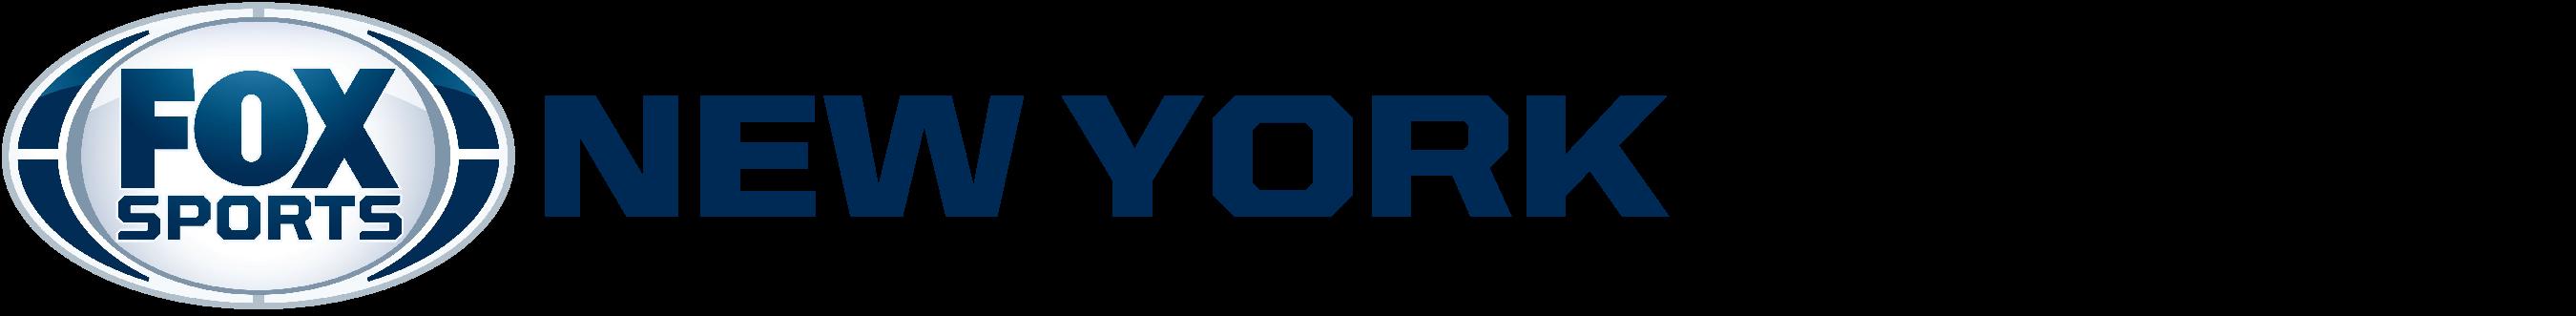 FOX Sports FOX Sports New York Logo Fox sports, Fox